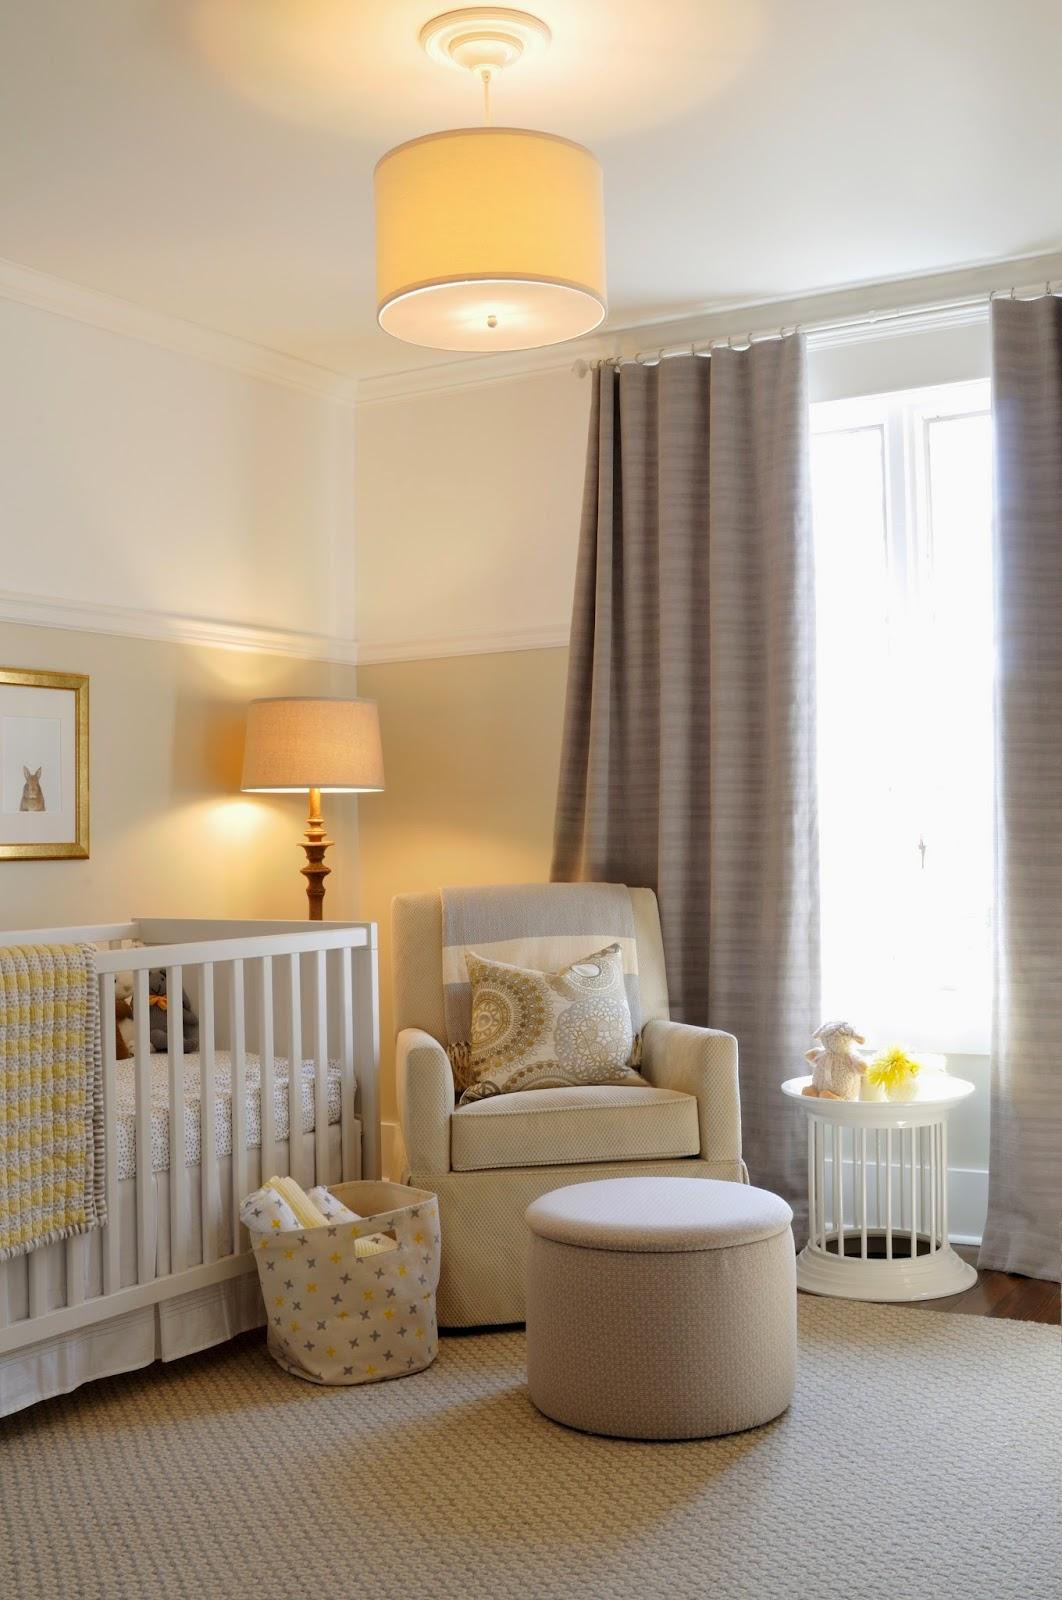 20 Extremely Lovely Neutral Nursery Room Decor Ideas That ... on Decor Room  id=87712